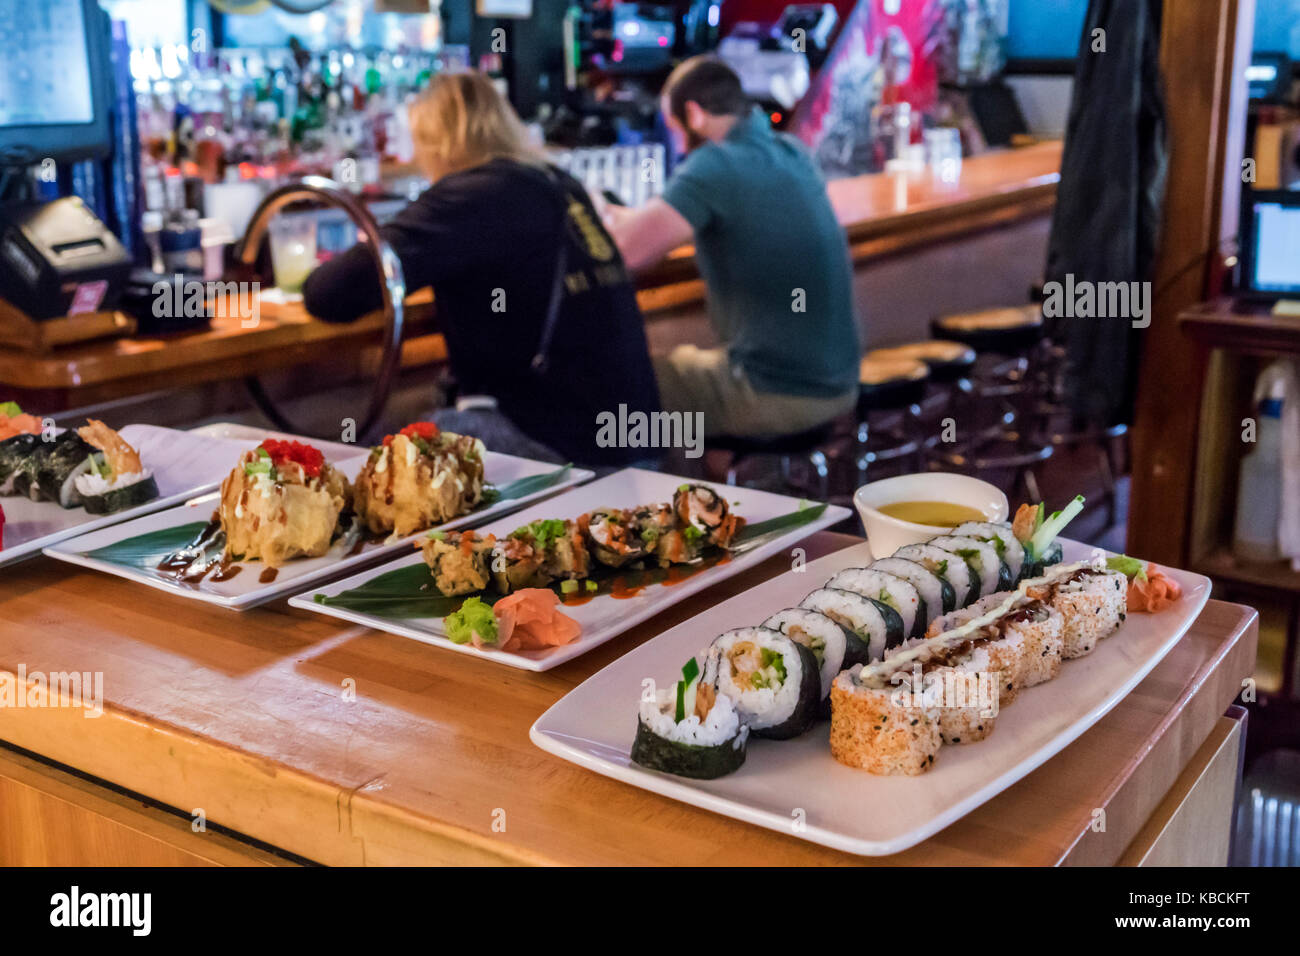 Richmond Food Restaurant Stockfotos & Richmond Food Restaurant ...